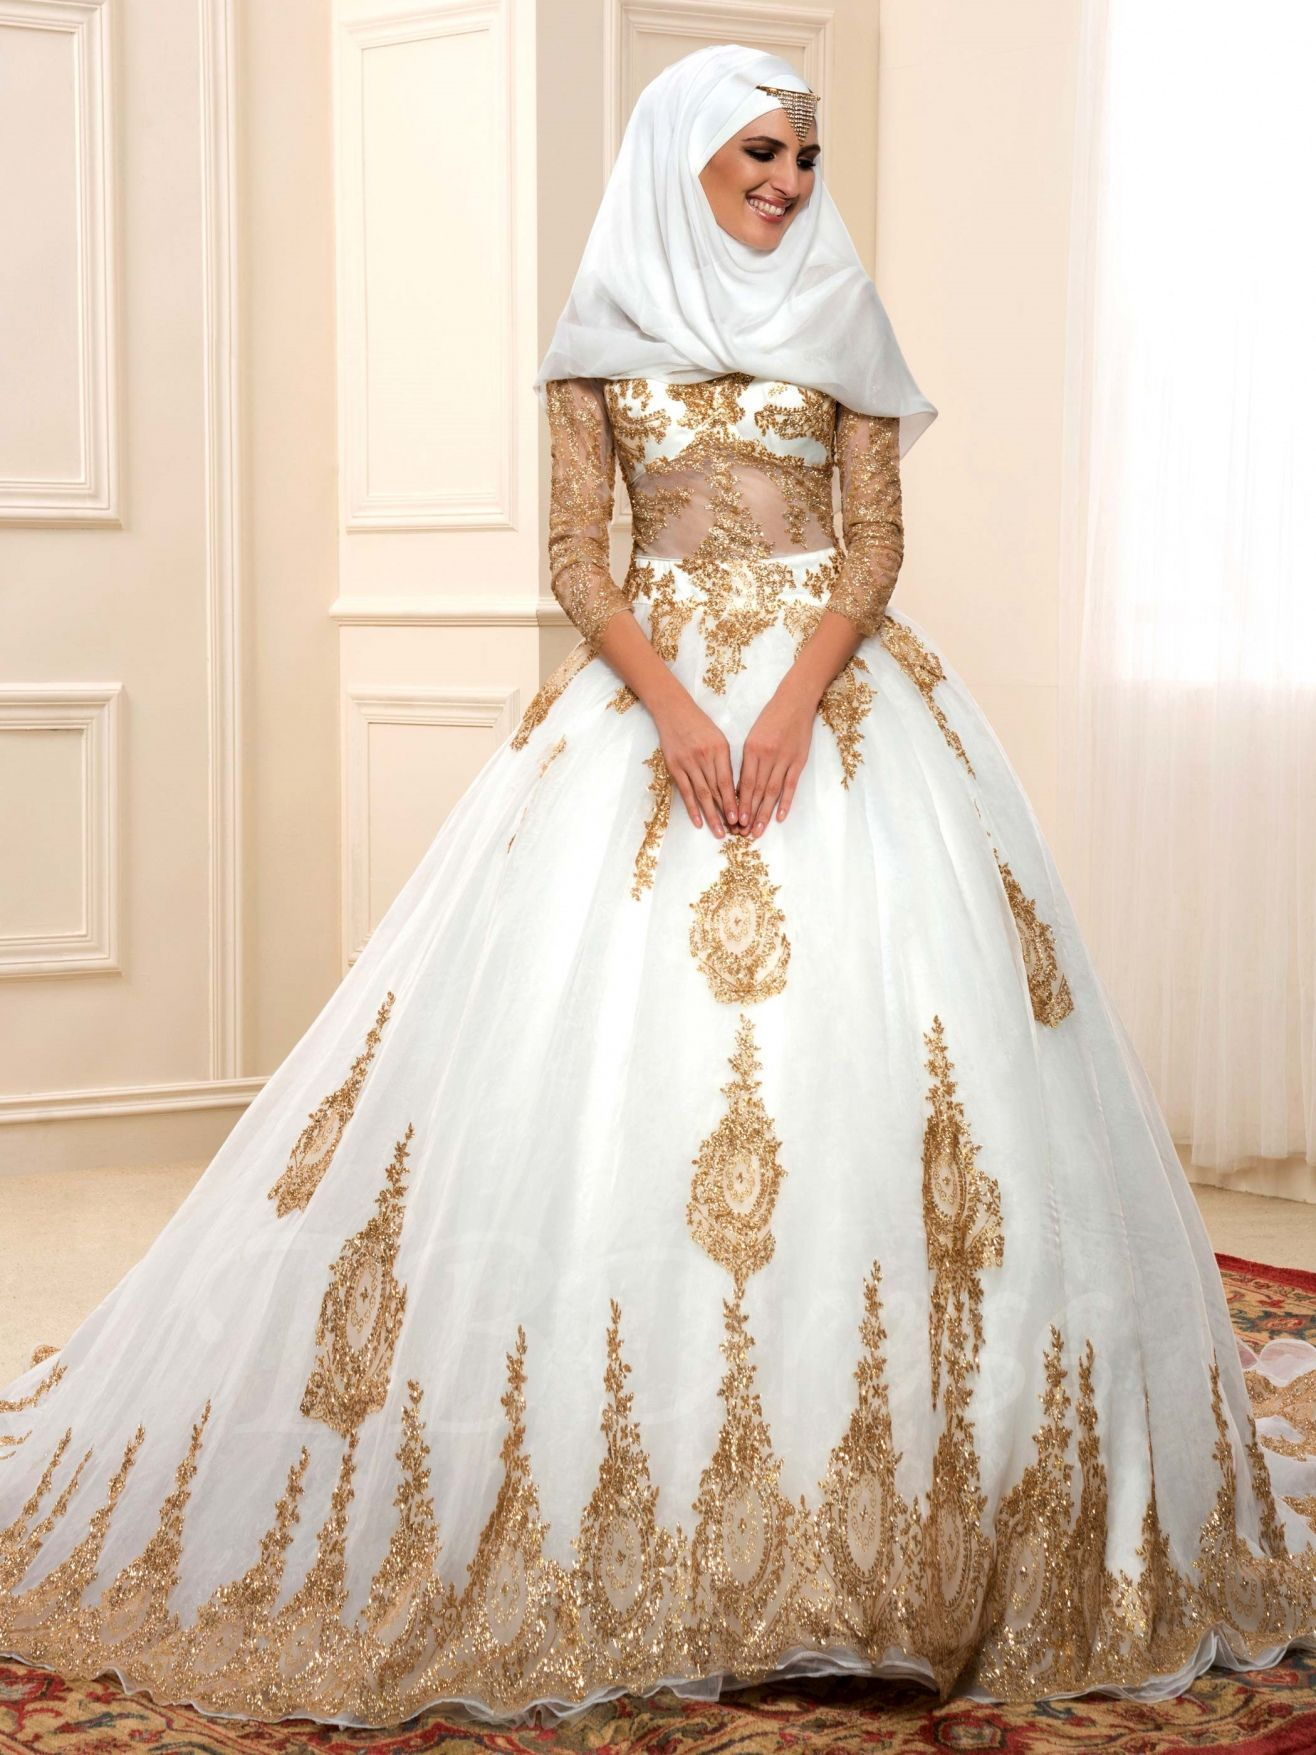 pics of muslim wedding dresses best dresses for wedding check